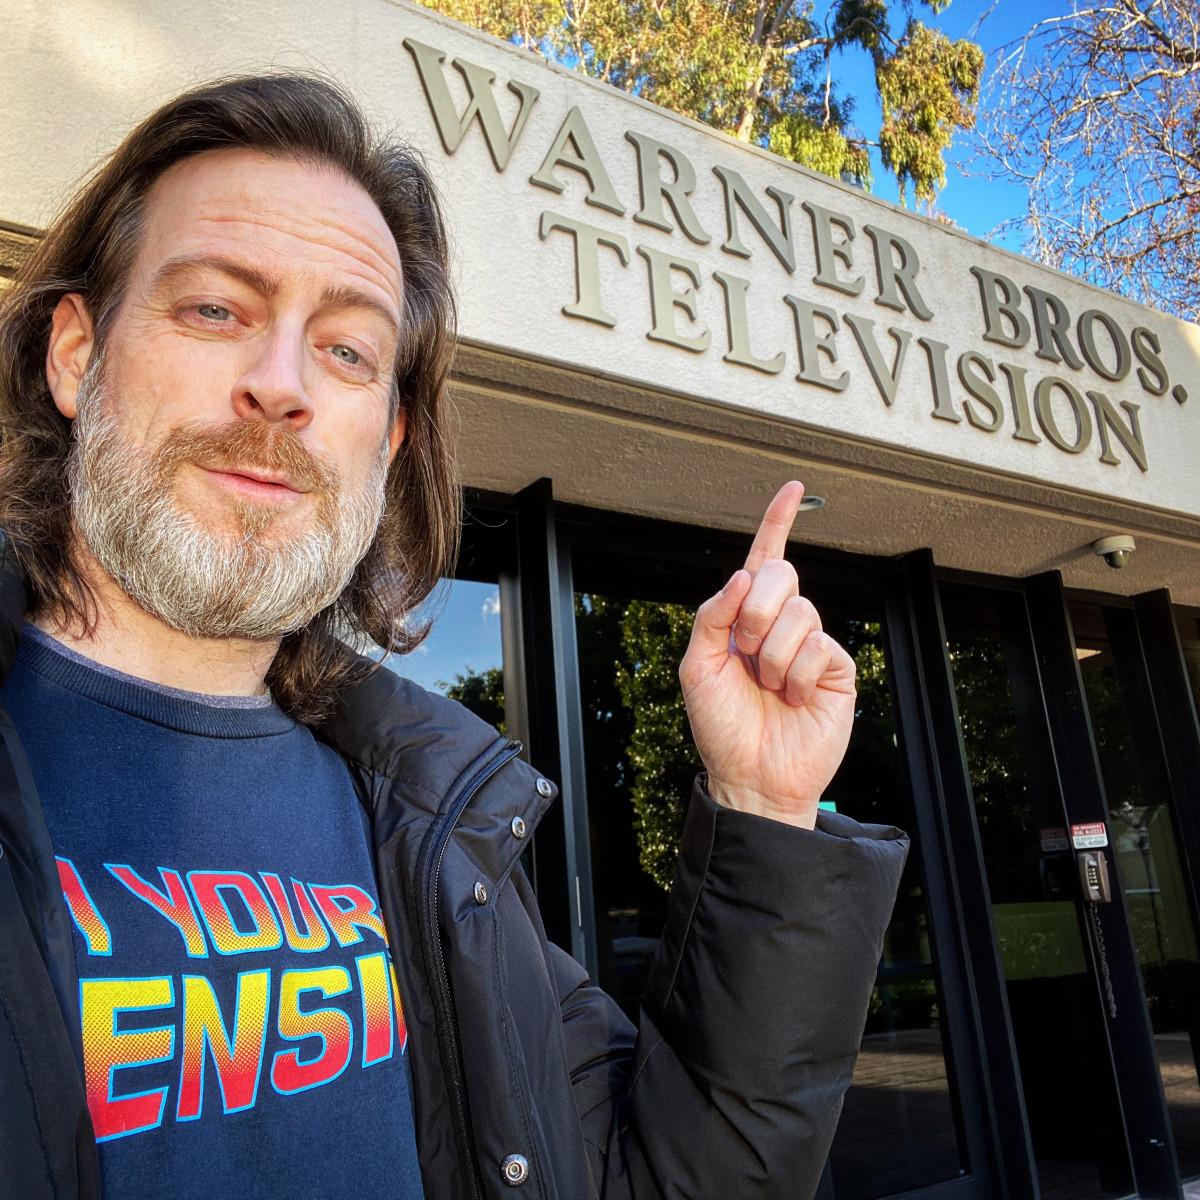 Chris Rafferty at Warner Bros. Photo courtesy Chris Rafferty